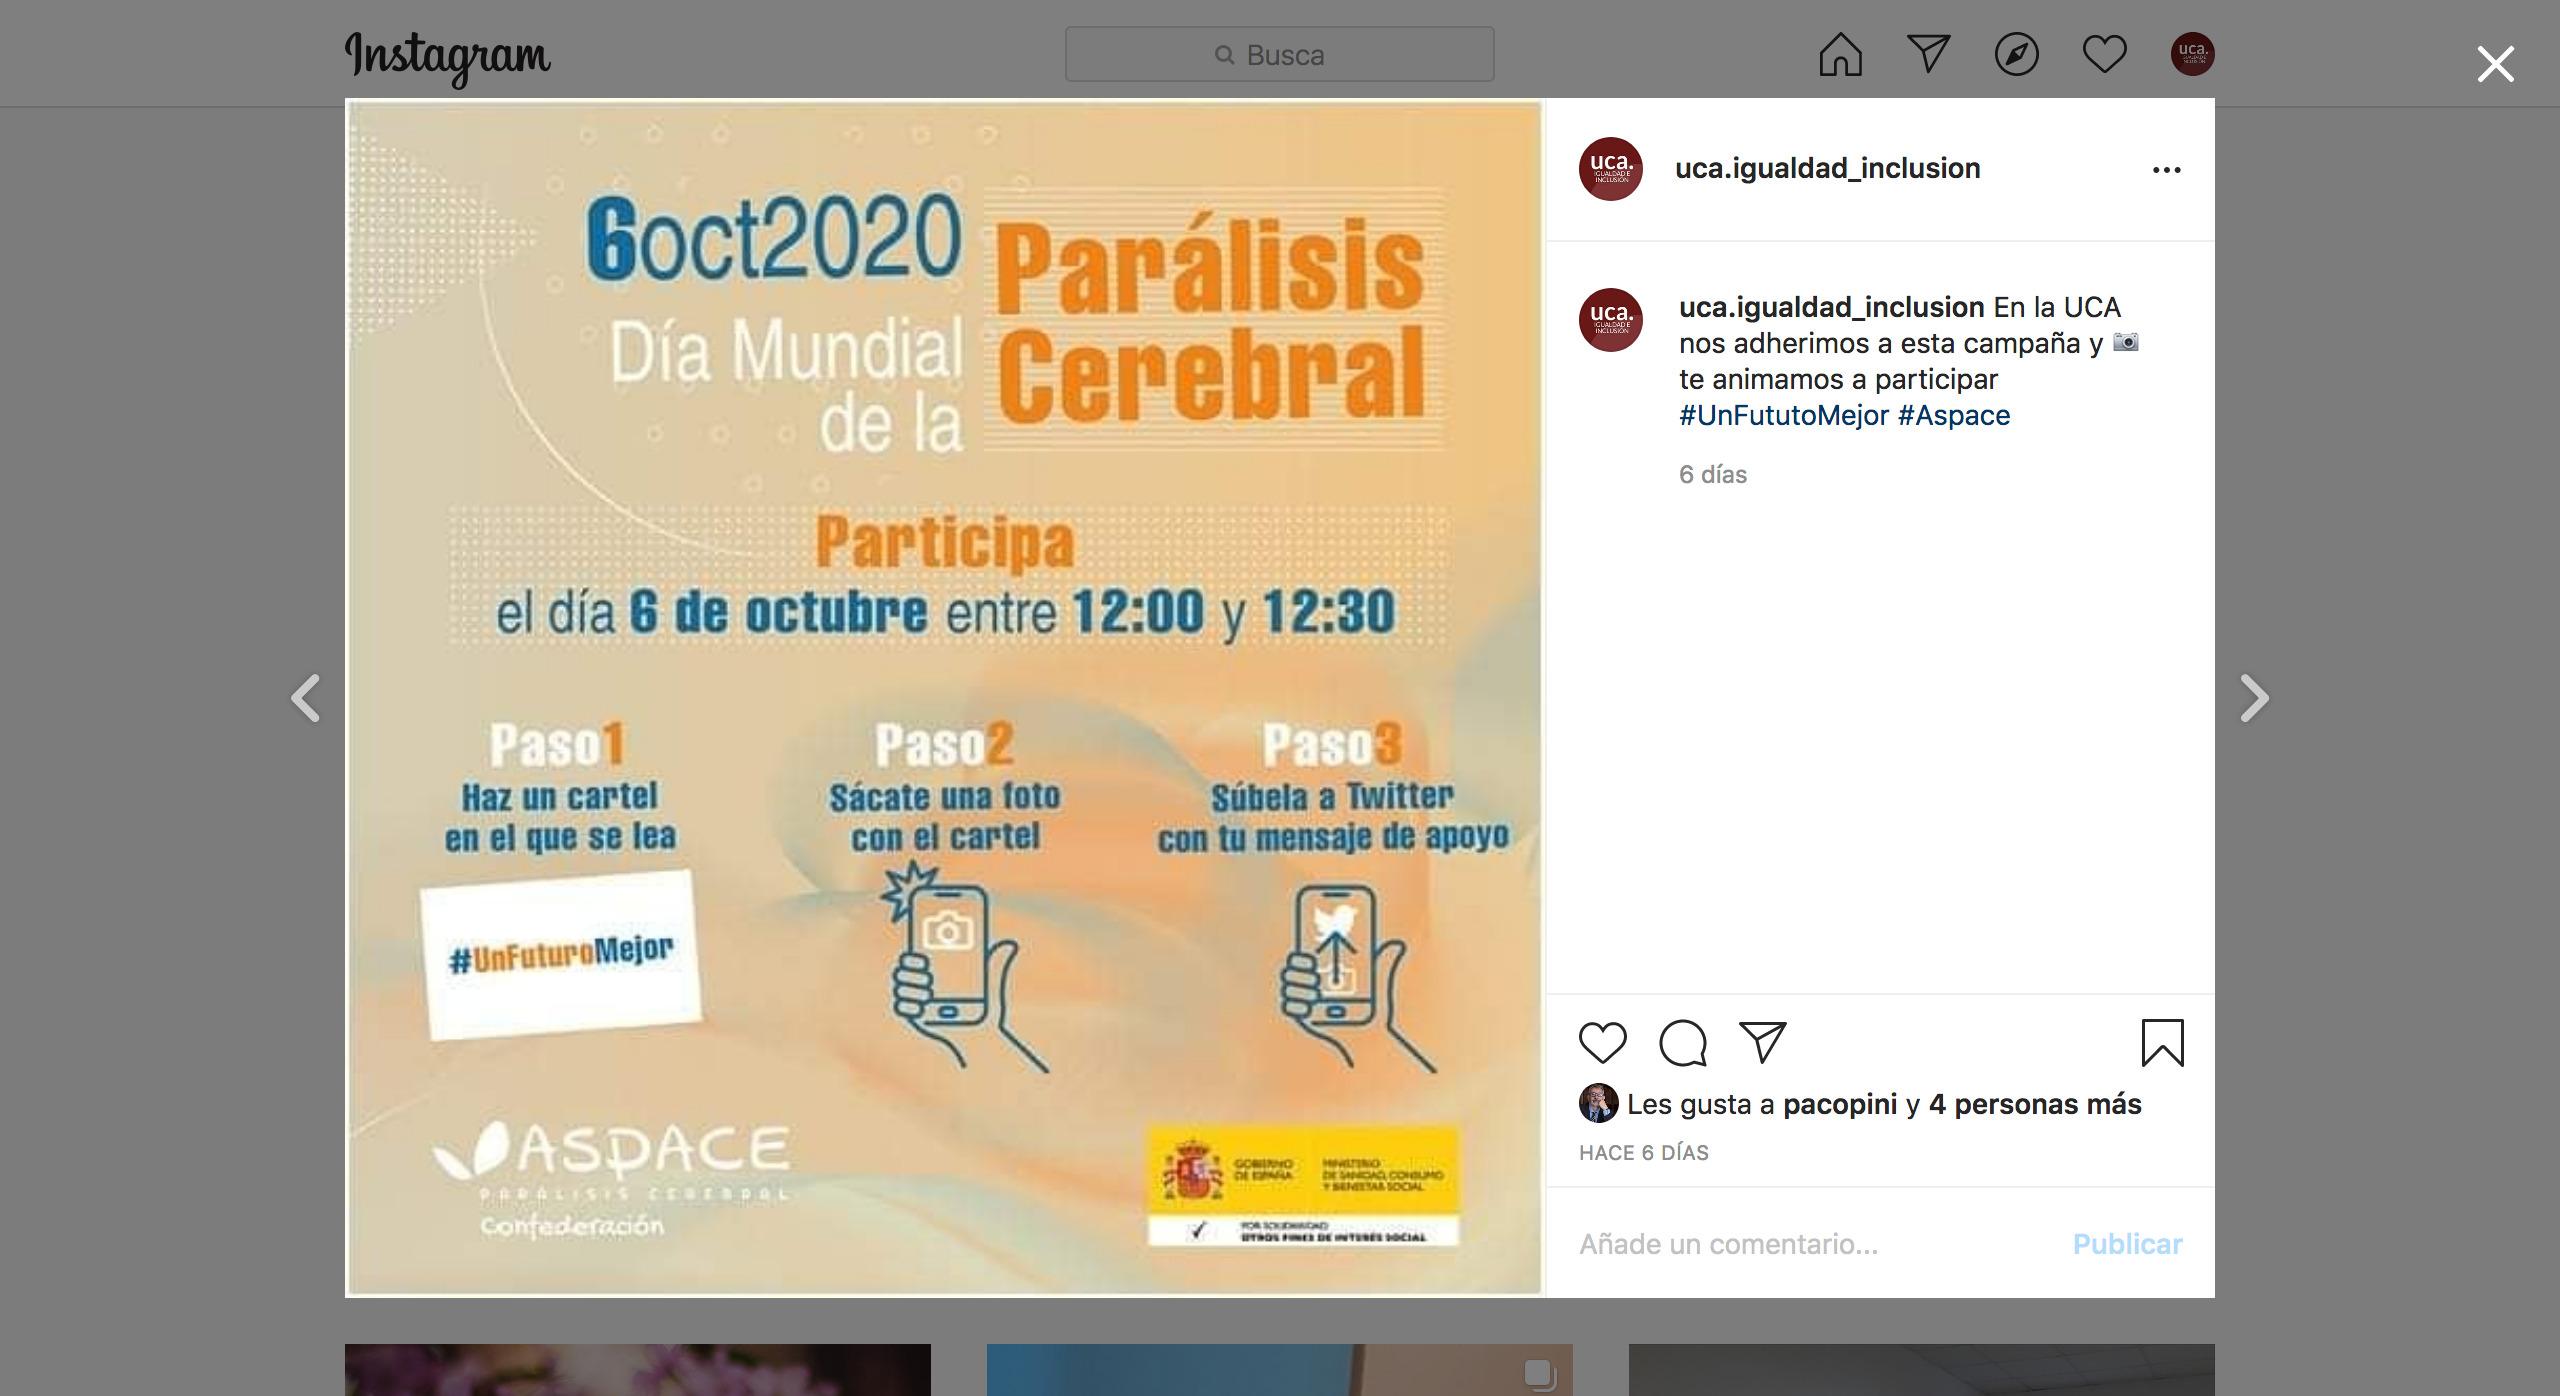 Campaña #UnFututoMejor #Aspace